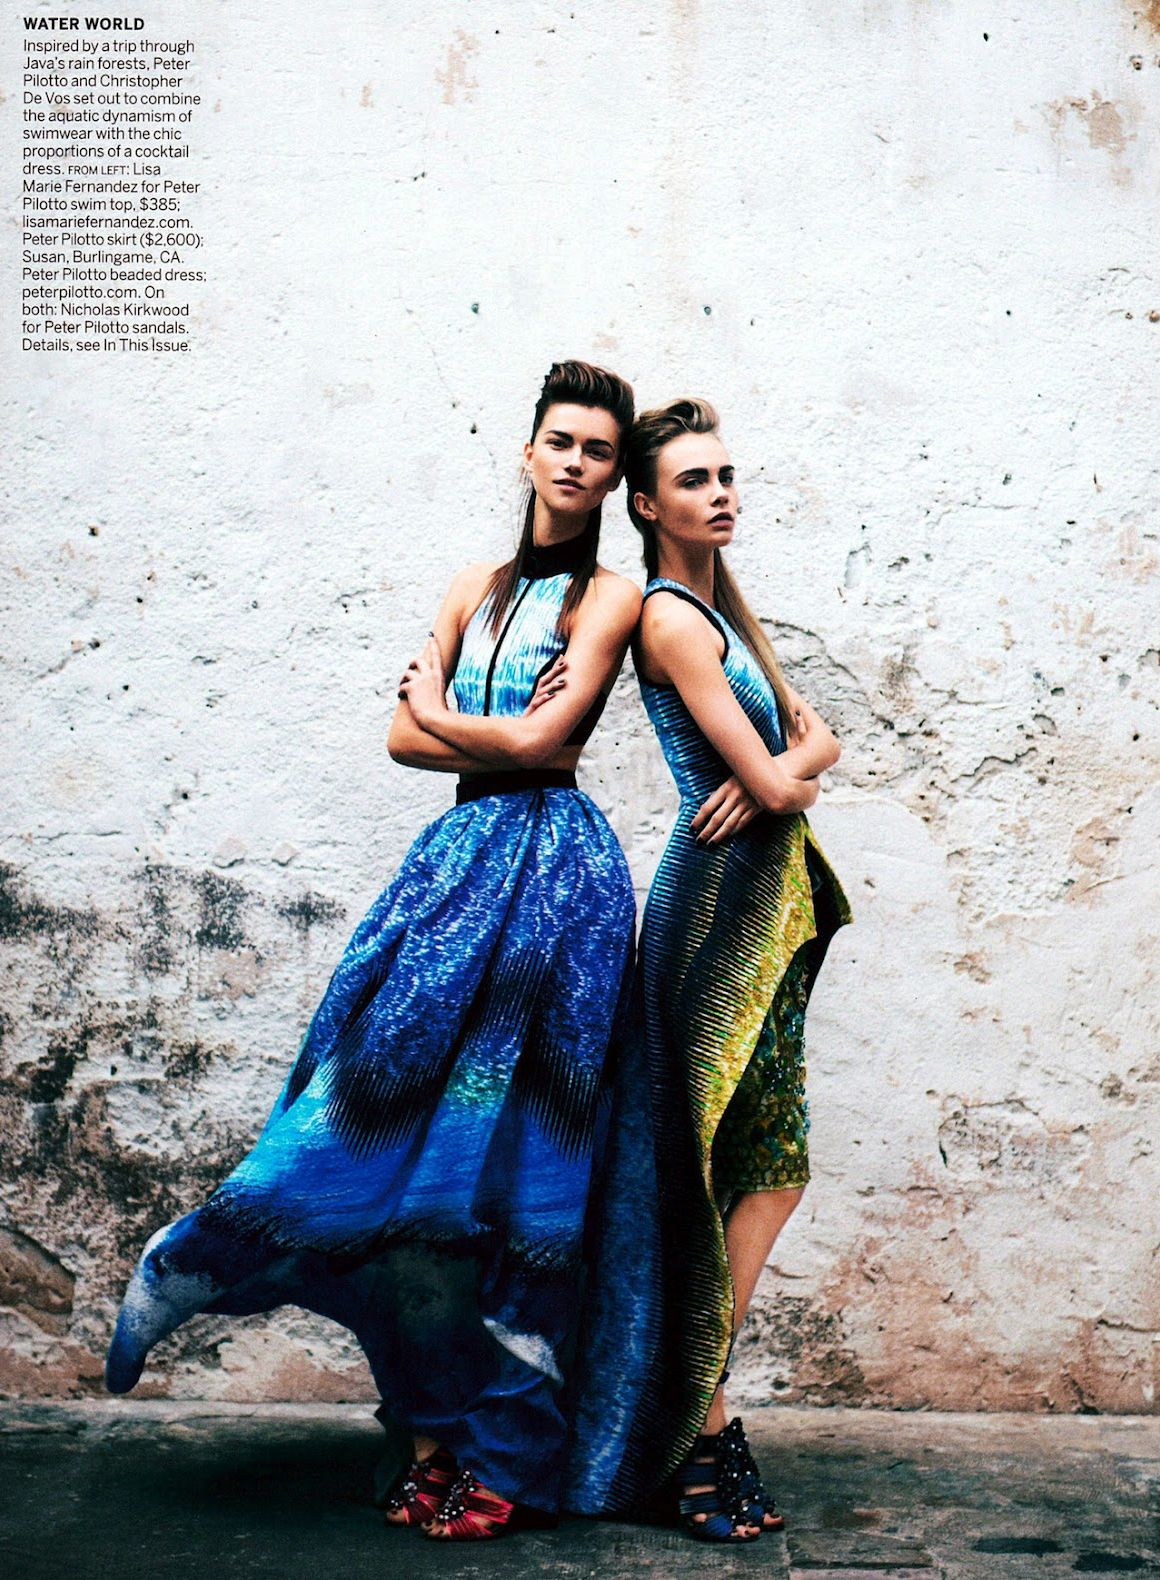 Cara Delevinge and Kasia Struss by Peter Lindbergh for Vogue US